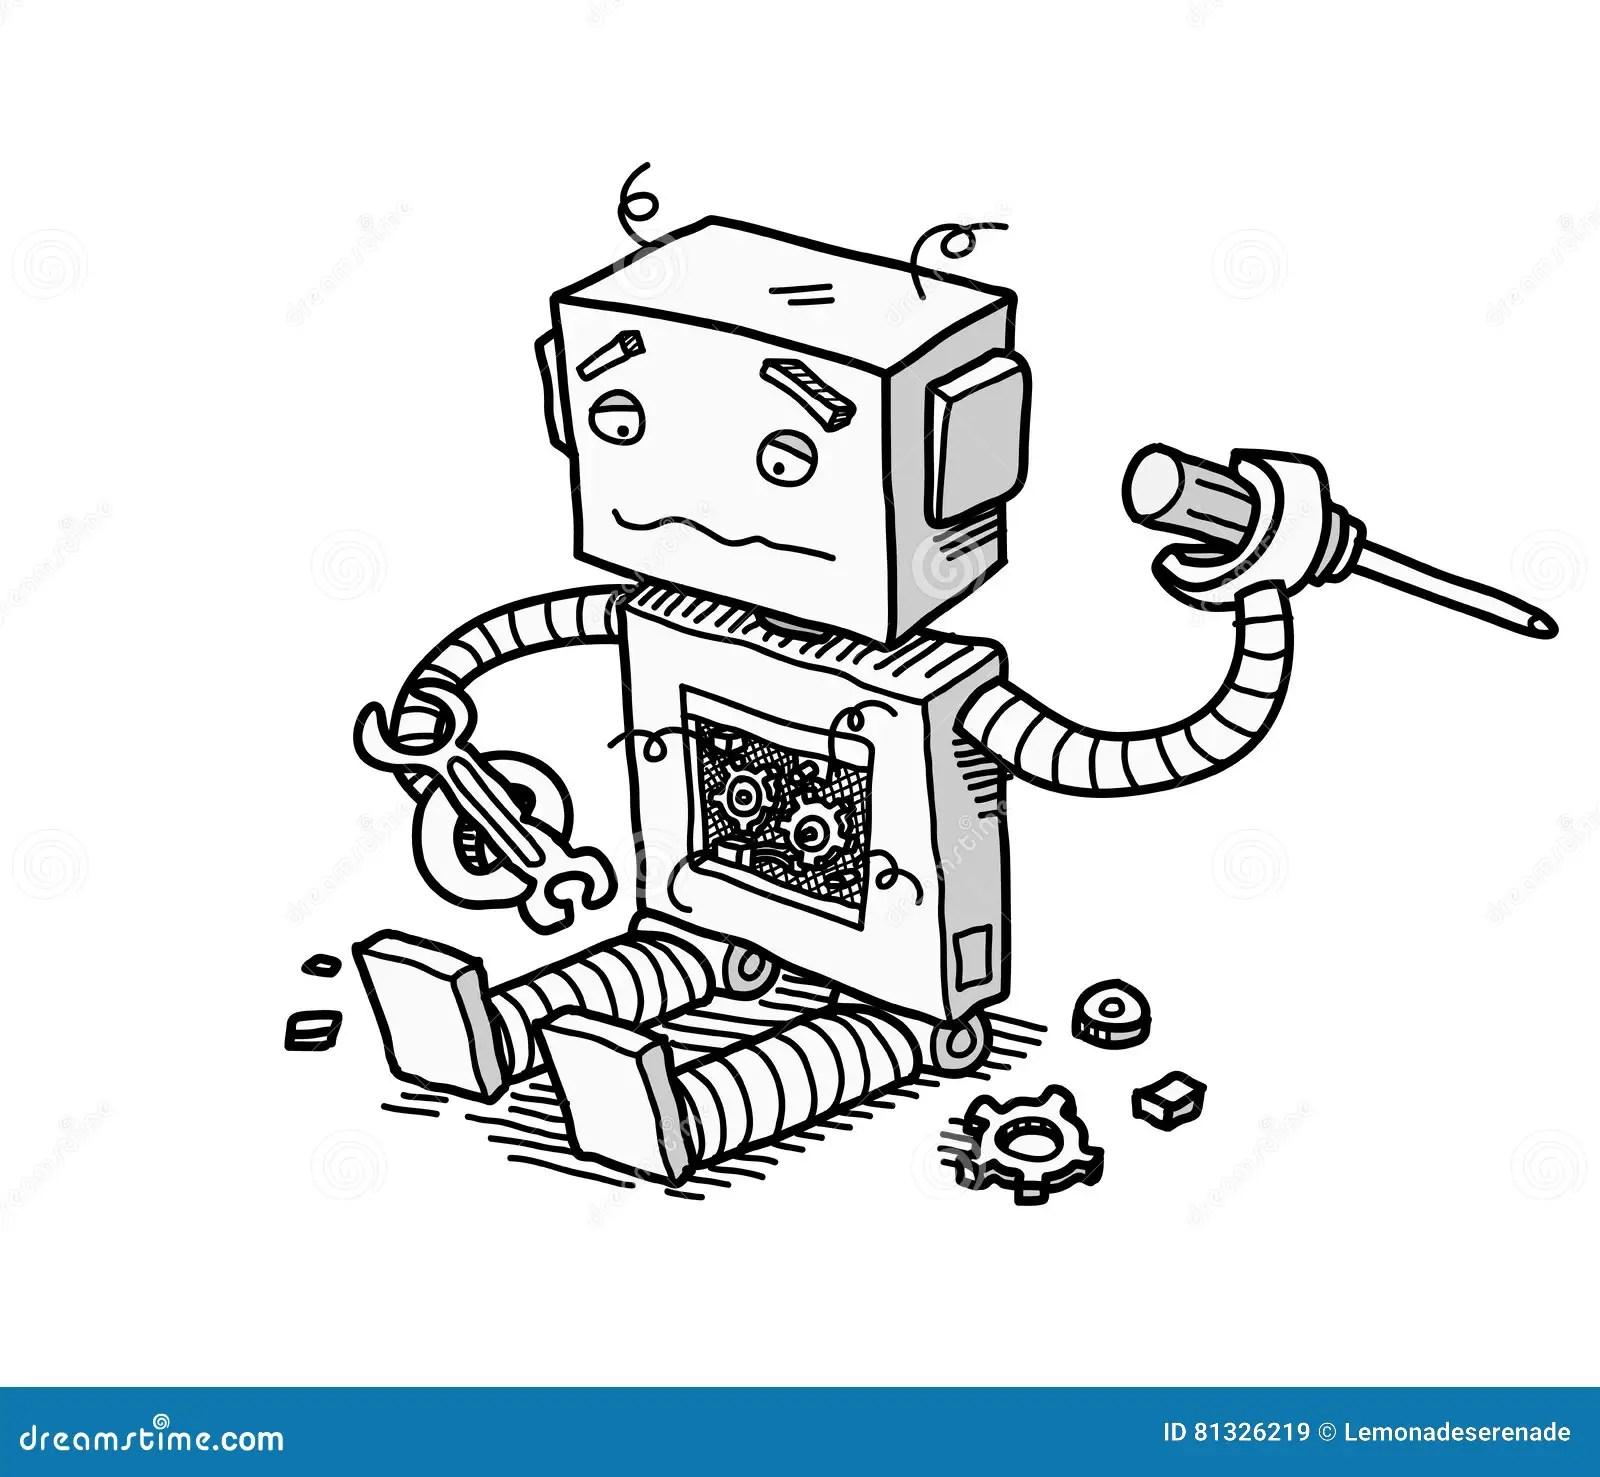 Broken Robot Fix Stock Vector Illustration Of Patch